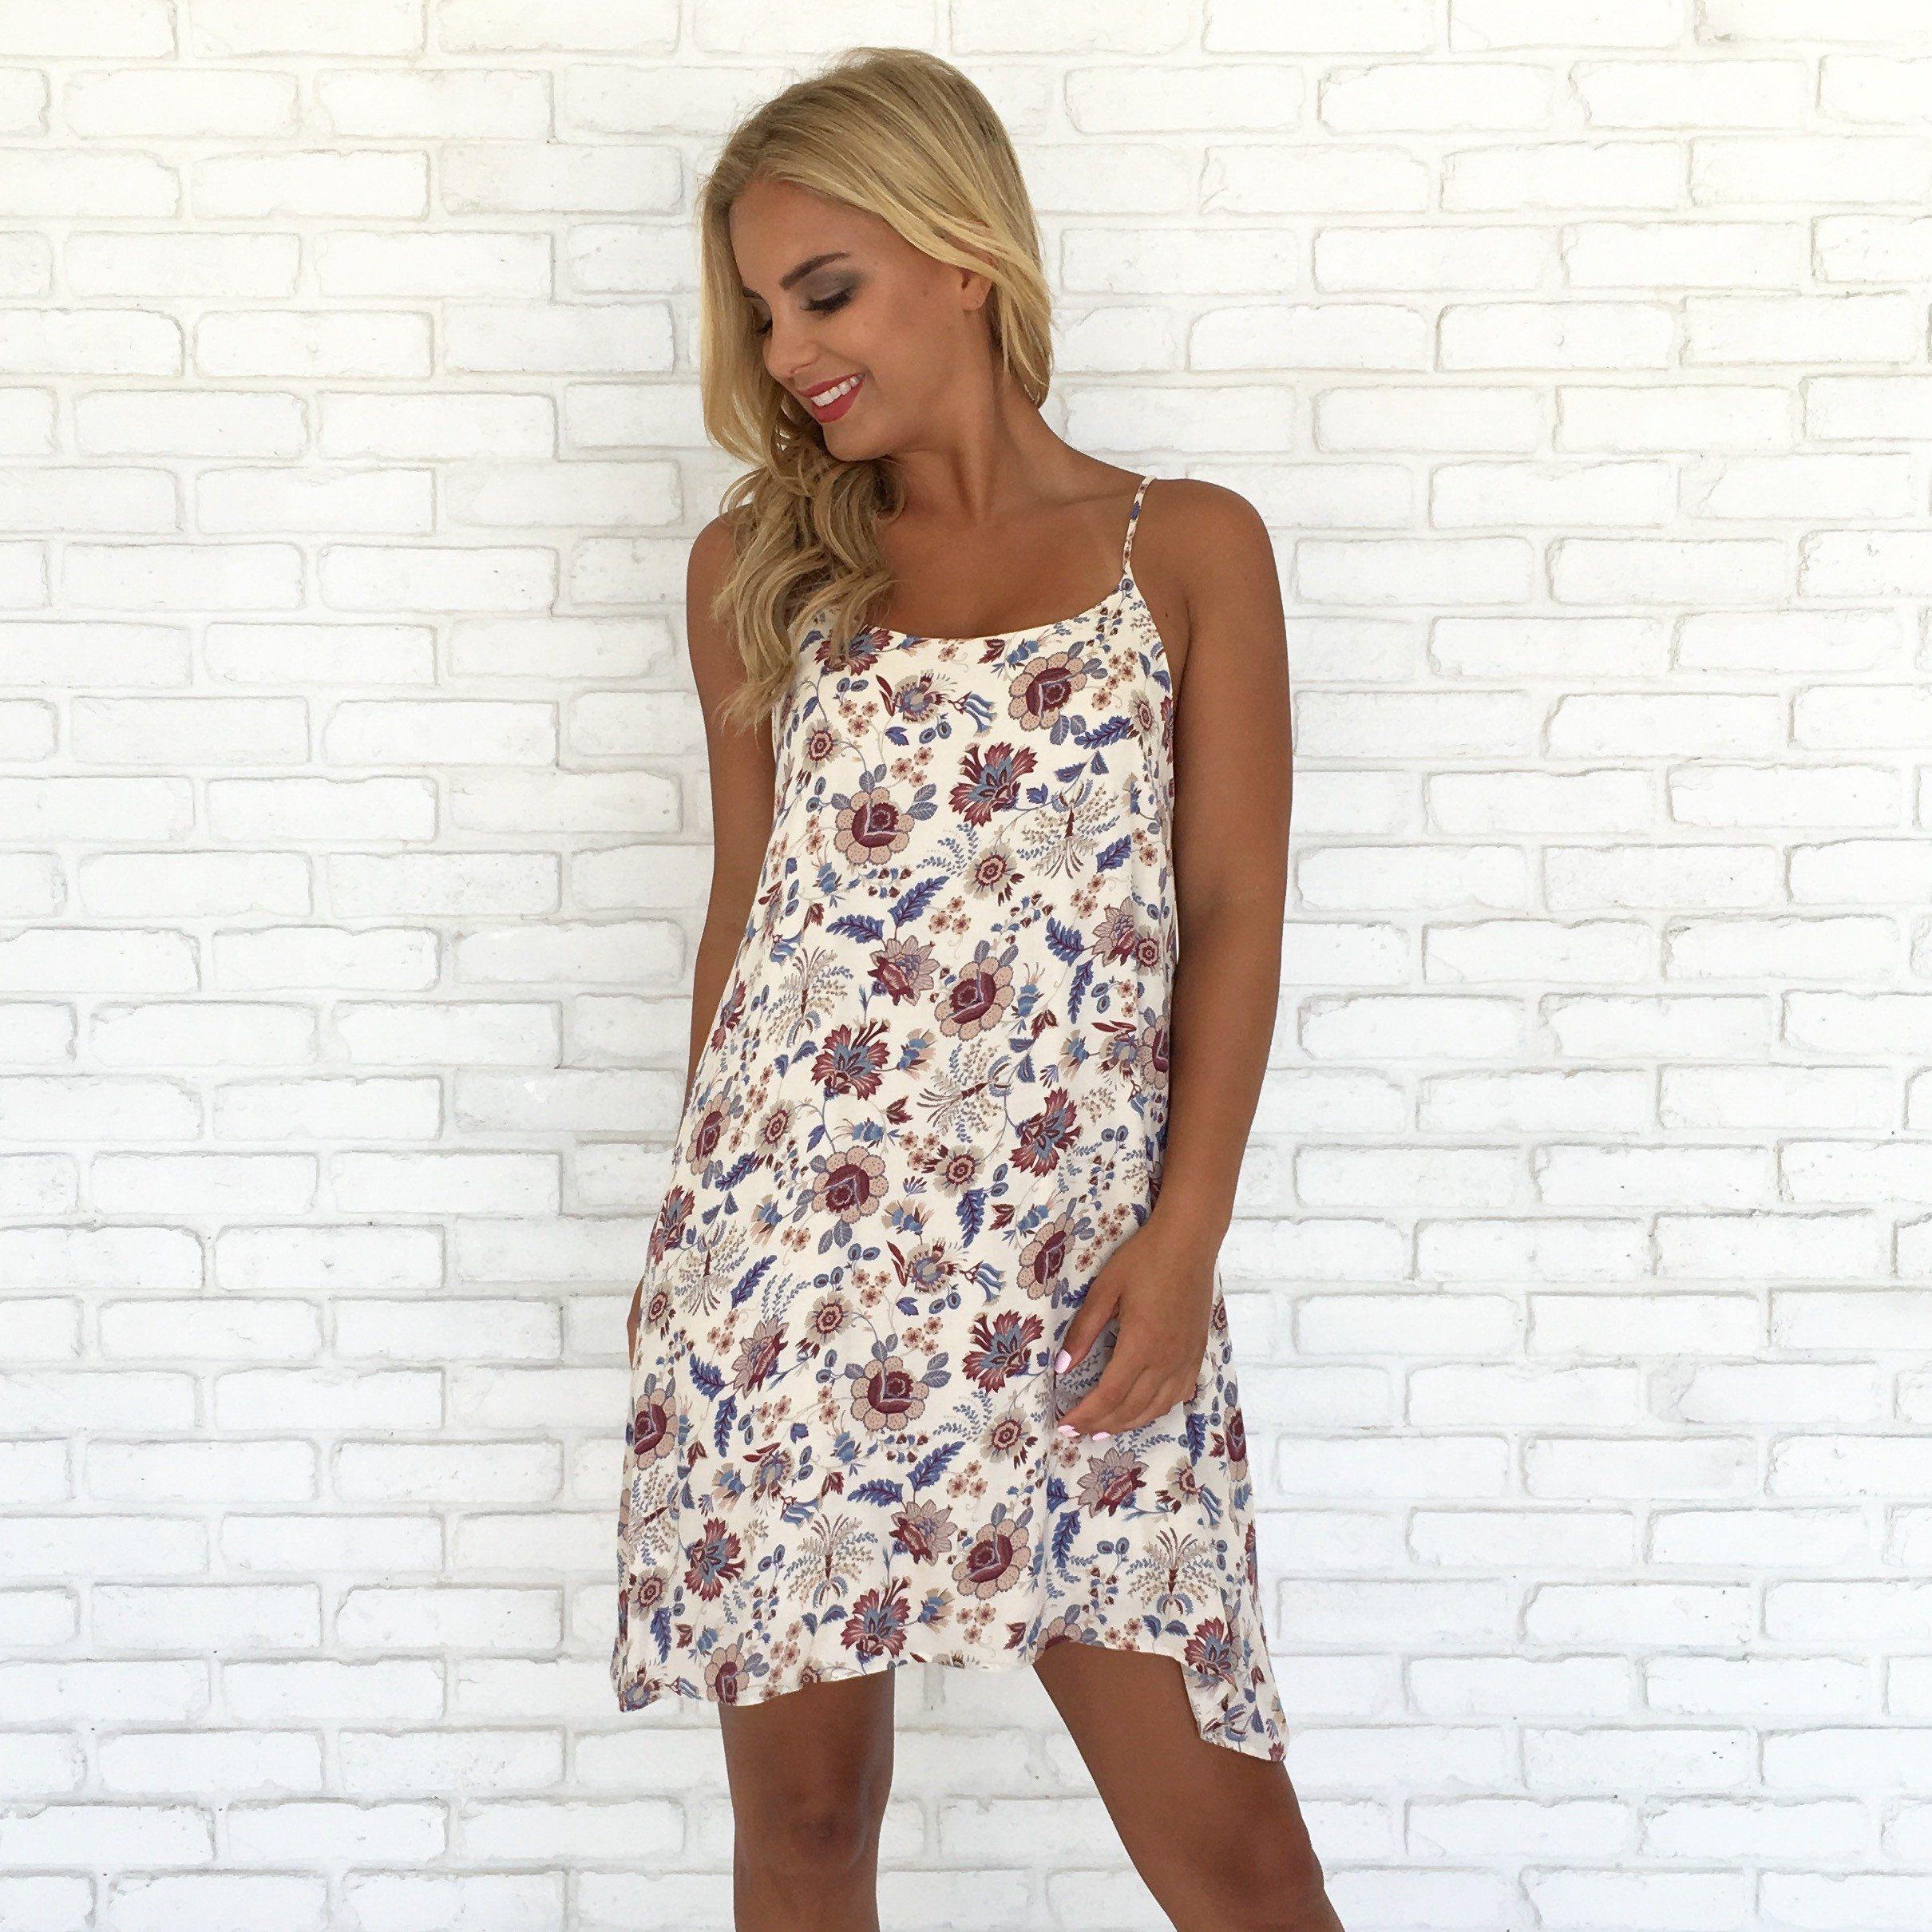 f0c2126f3f Amber Leaves Floral Shift Dress - Dainty Hooligan Boutique